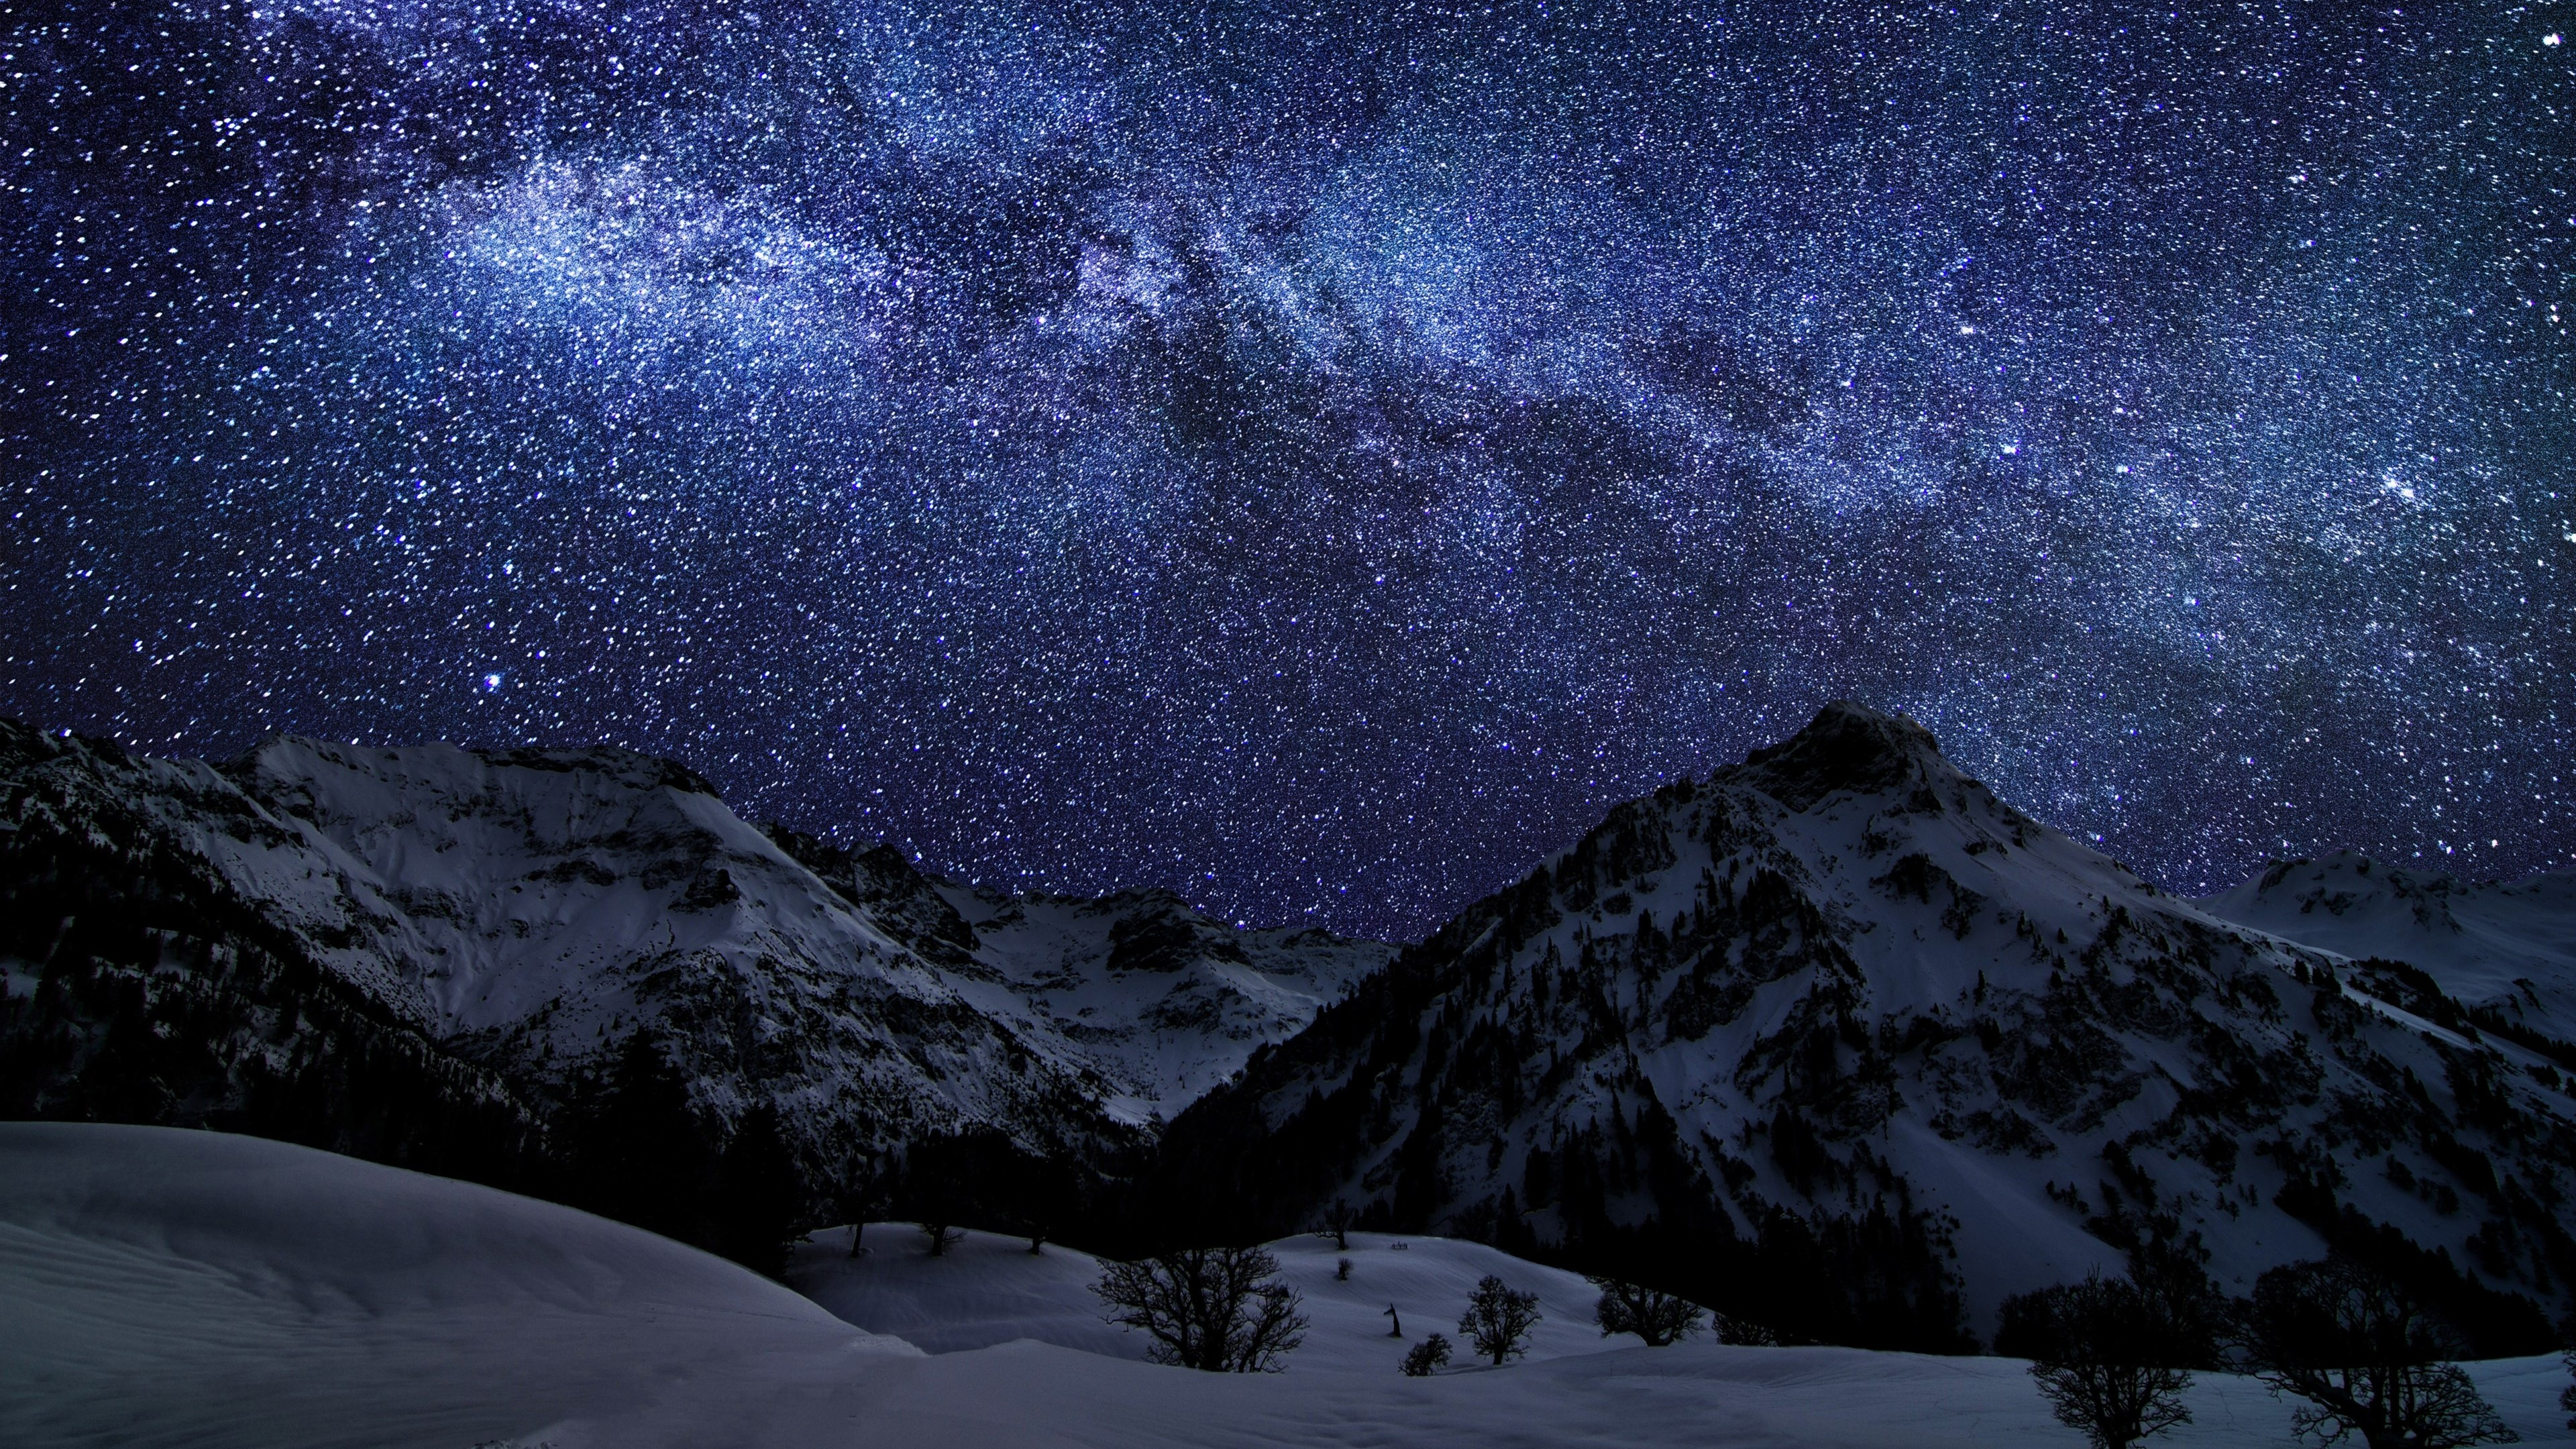 Wallpaper night sky earth sky snow stars night sea - Night mountain wallpaper 4k ...